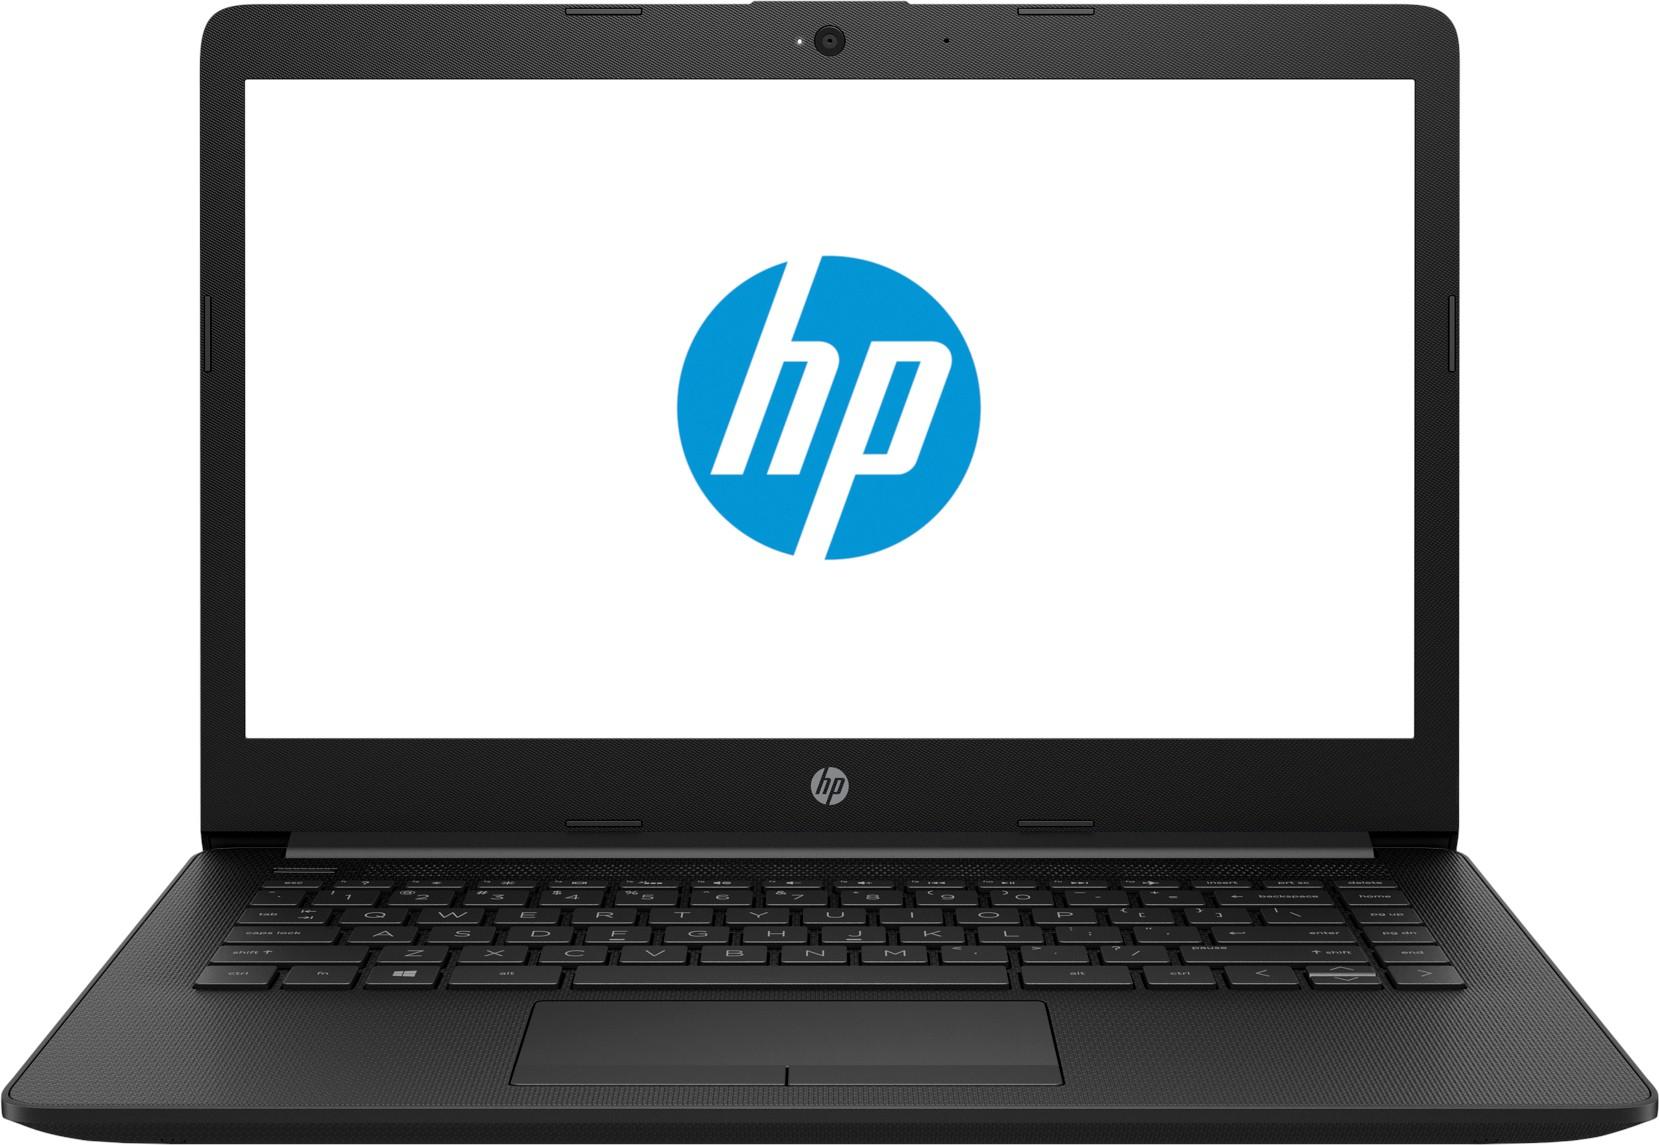 HP 14q Core i3 7th Gen 14q-cs0009TU Laptop Image